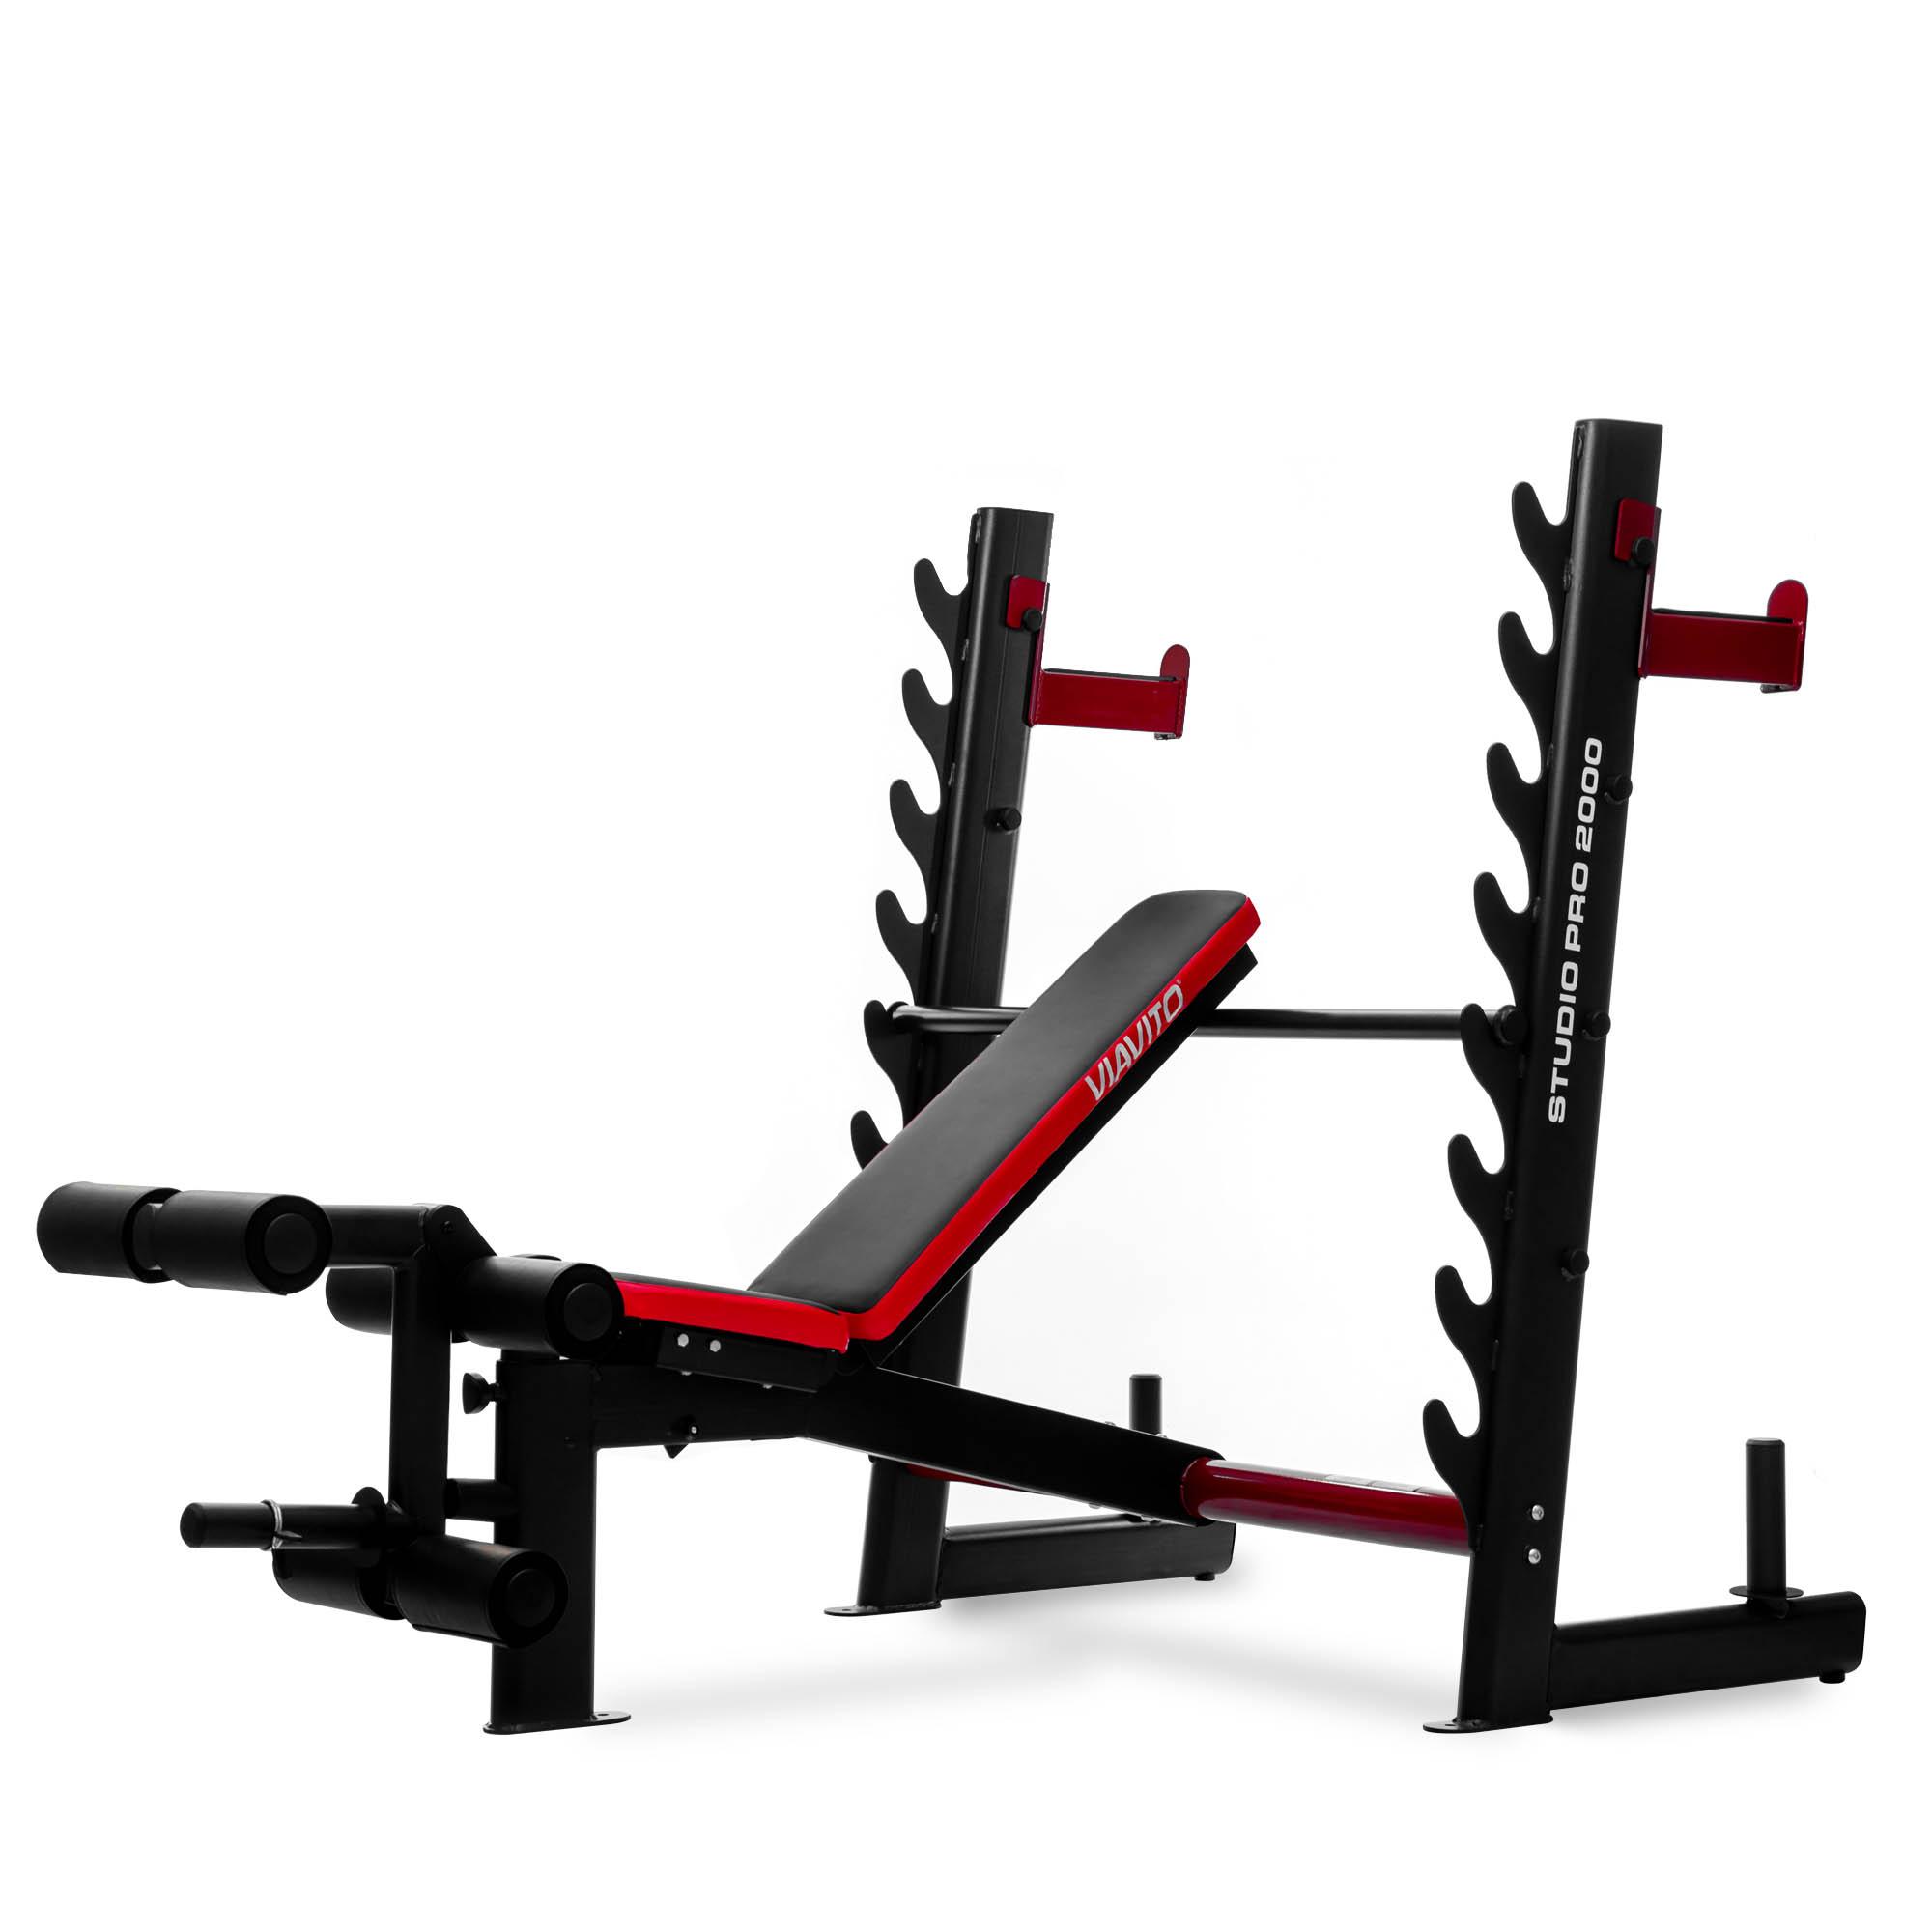 Viavito Studio Pro 2000 Olympic Barbell Weight Bench